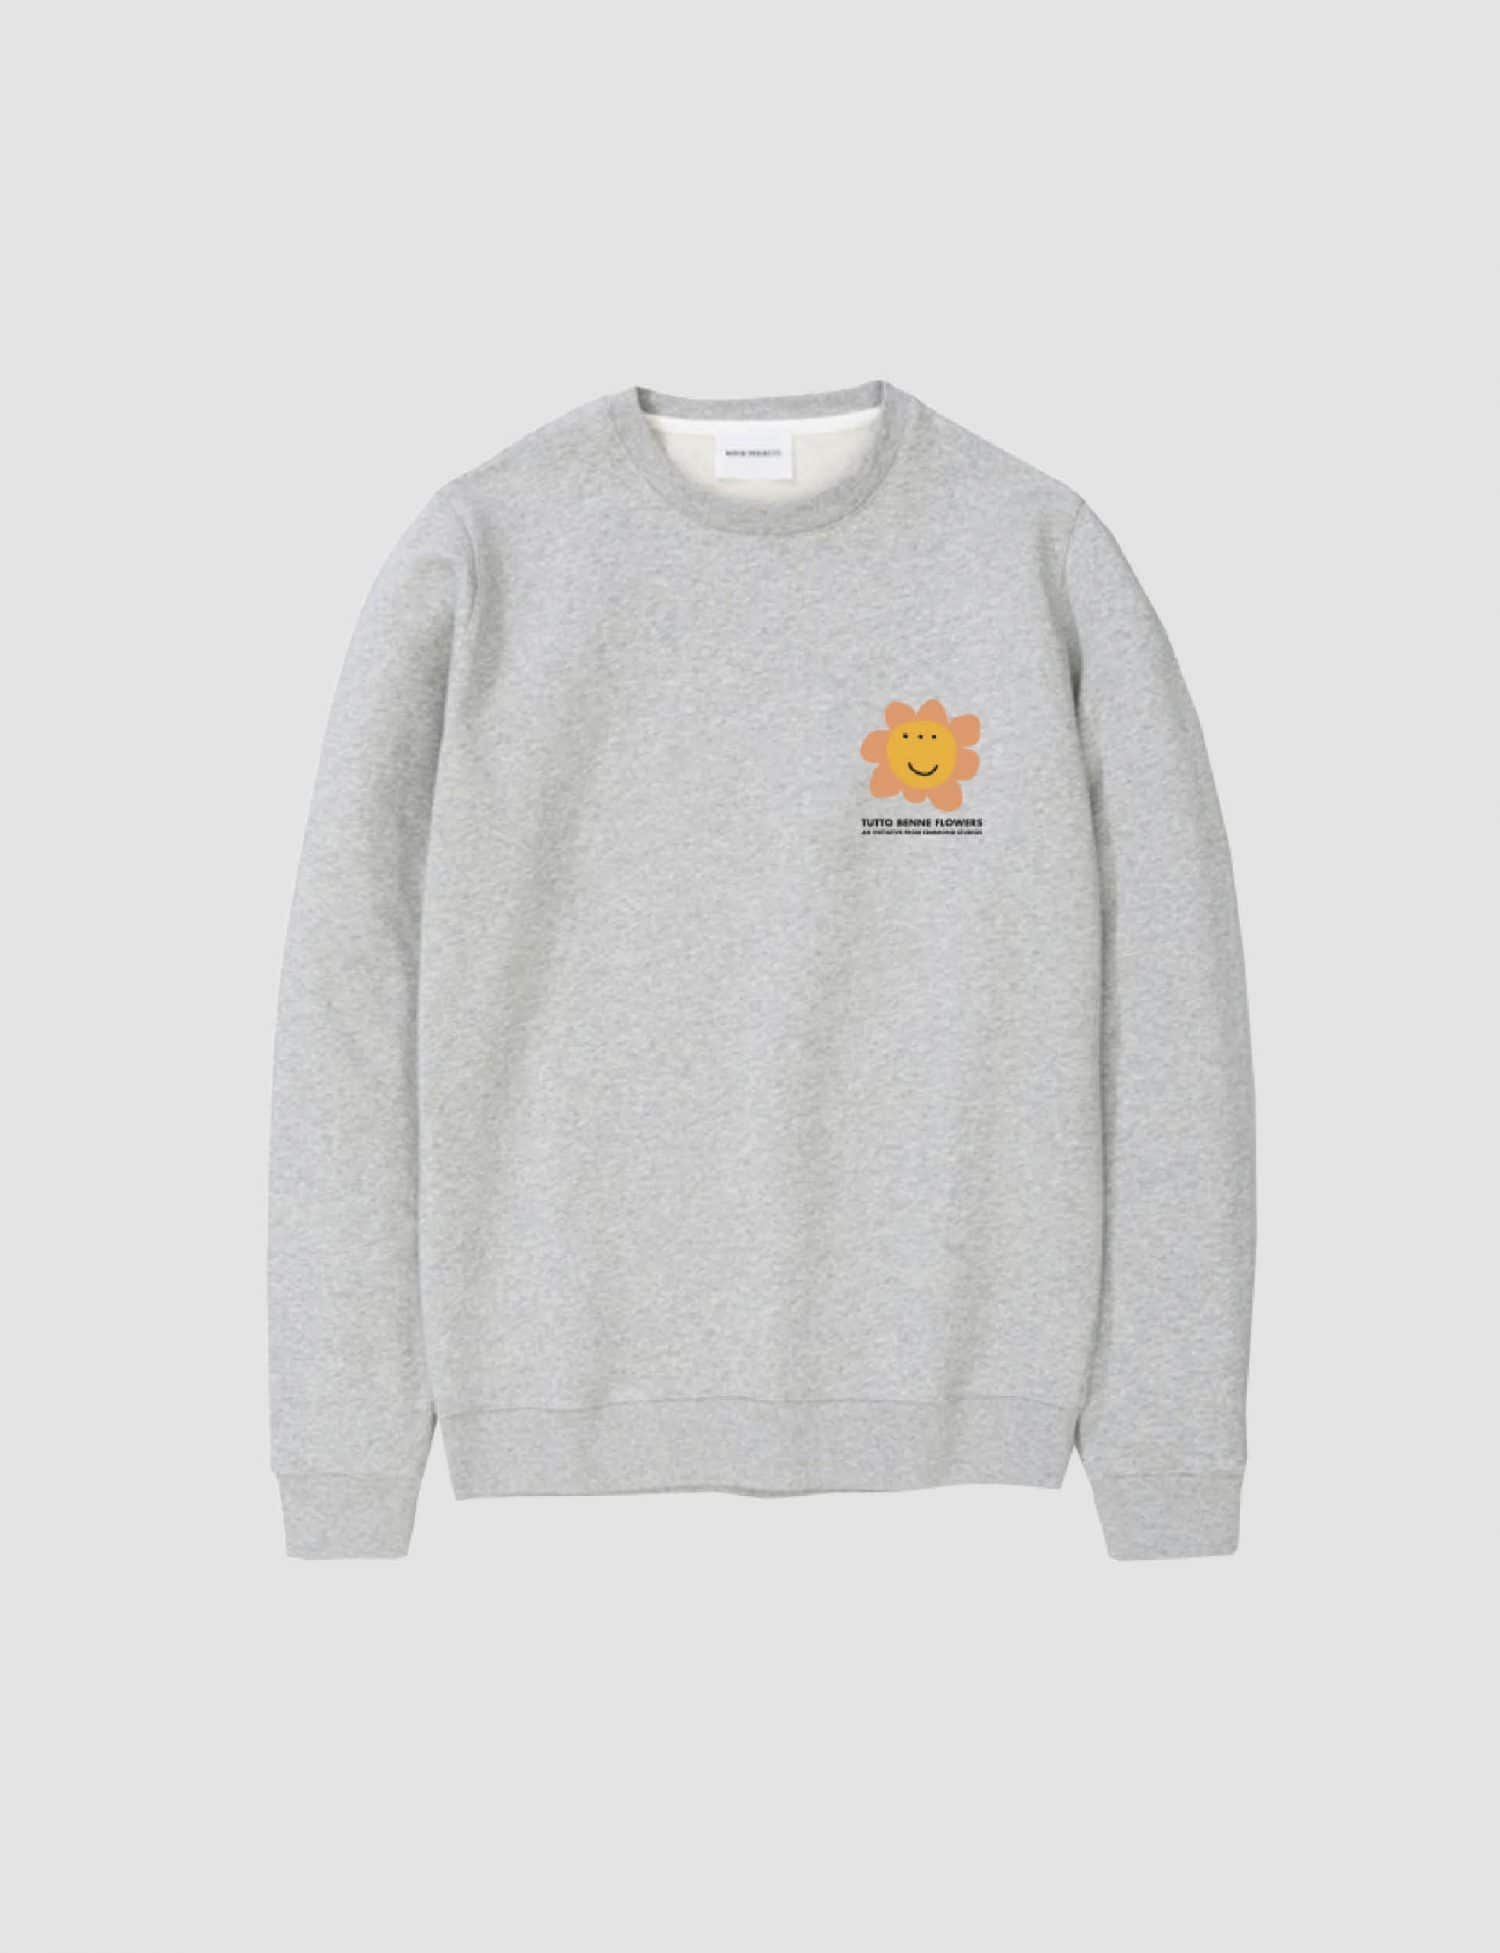 Castart - Edmmond Tutto bene sweater - Grey